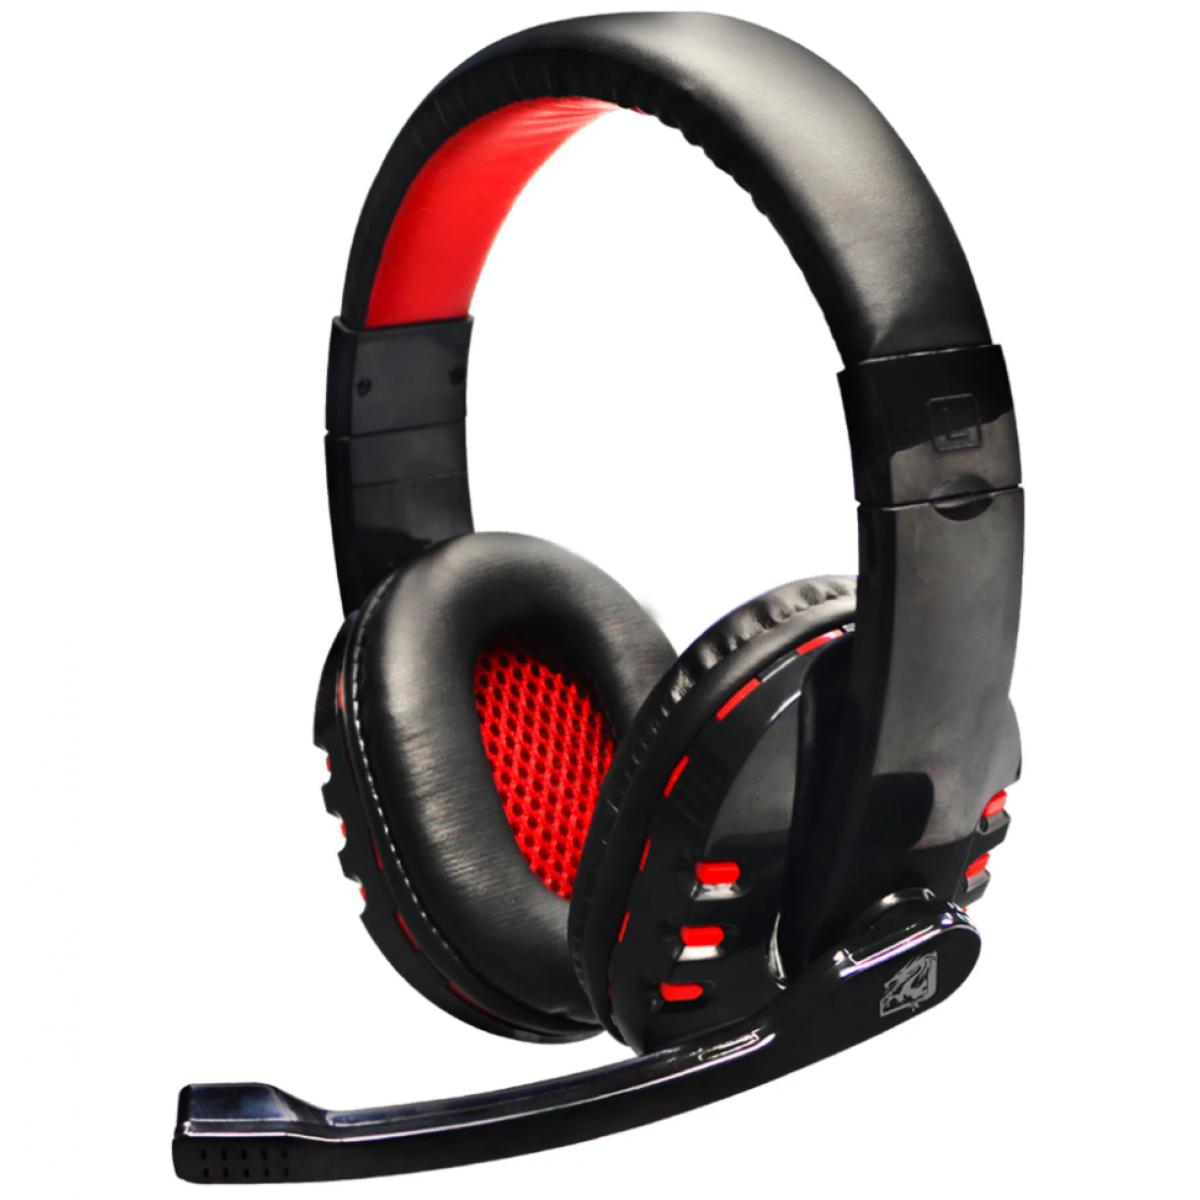 Combo Gamer ELG Striker 4 em 1, Teclado, Mouse, Headset, Mousepad, Red, CGSR41